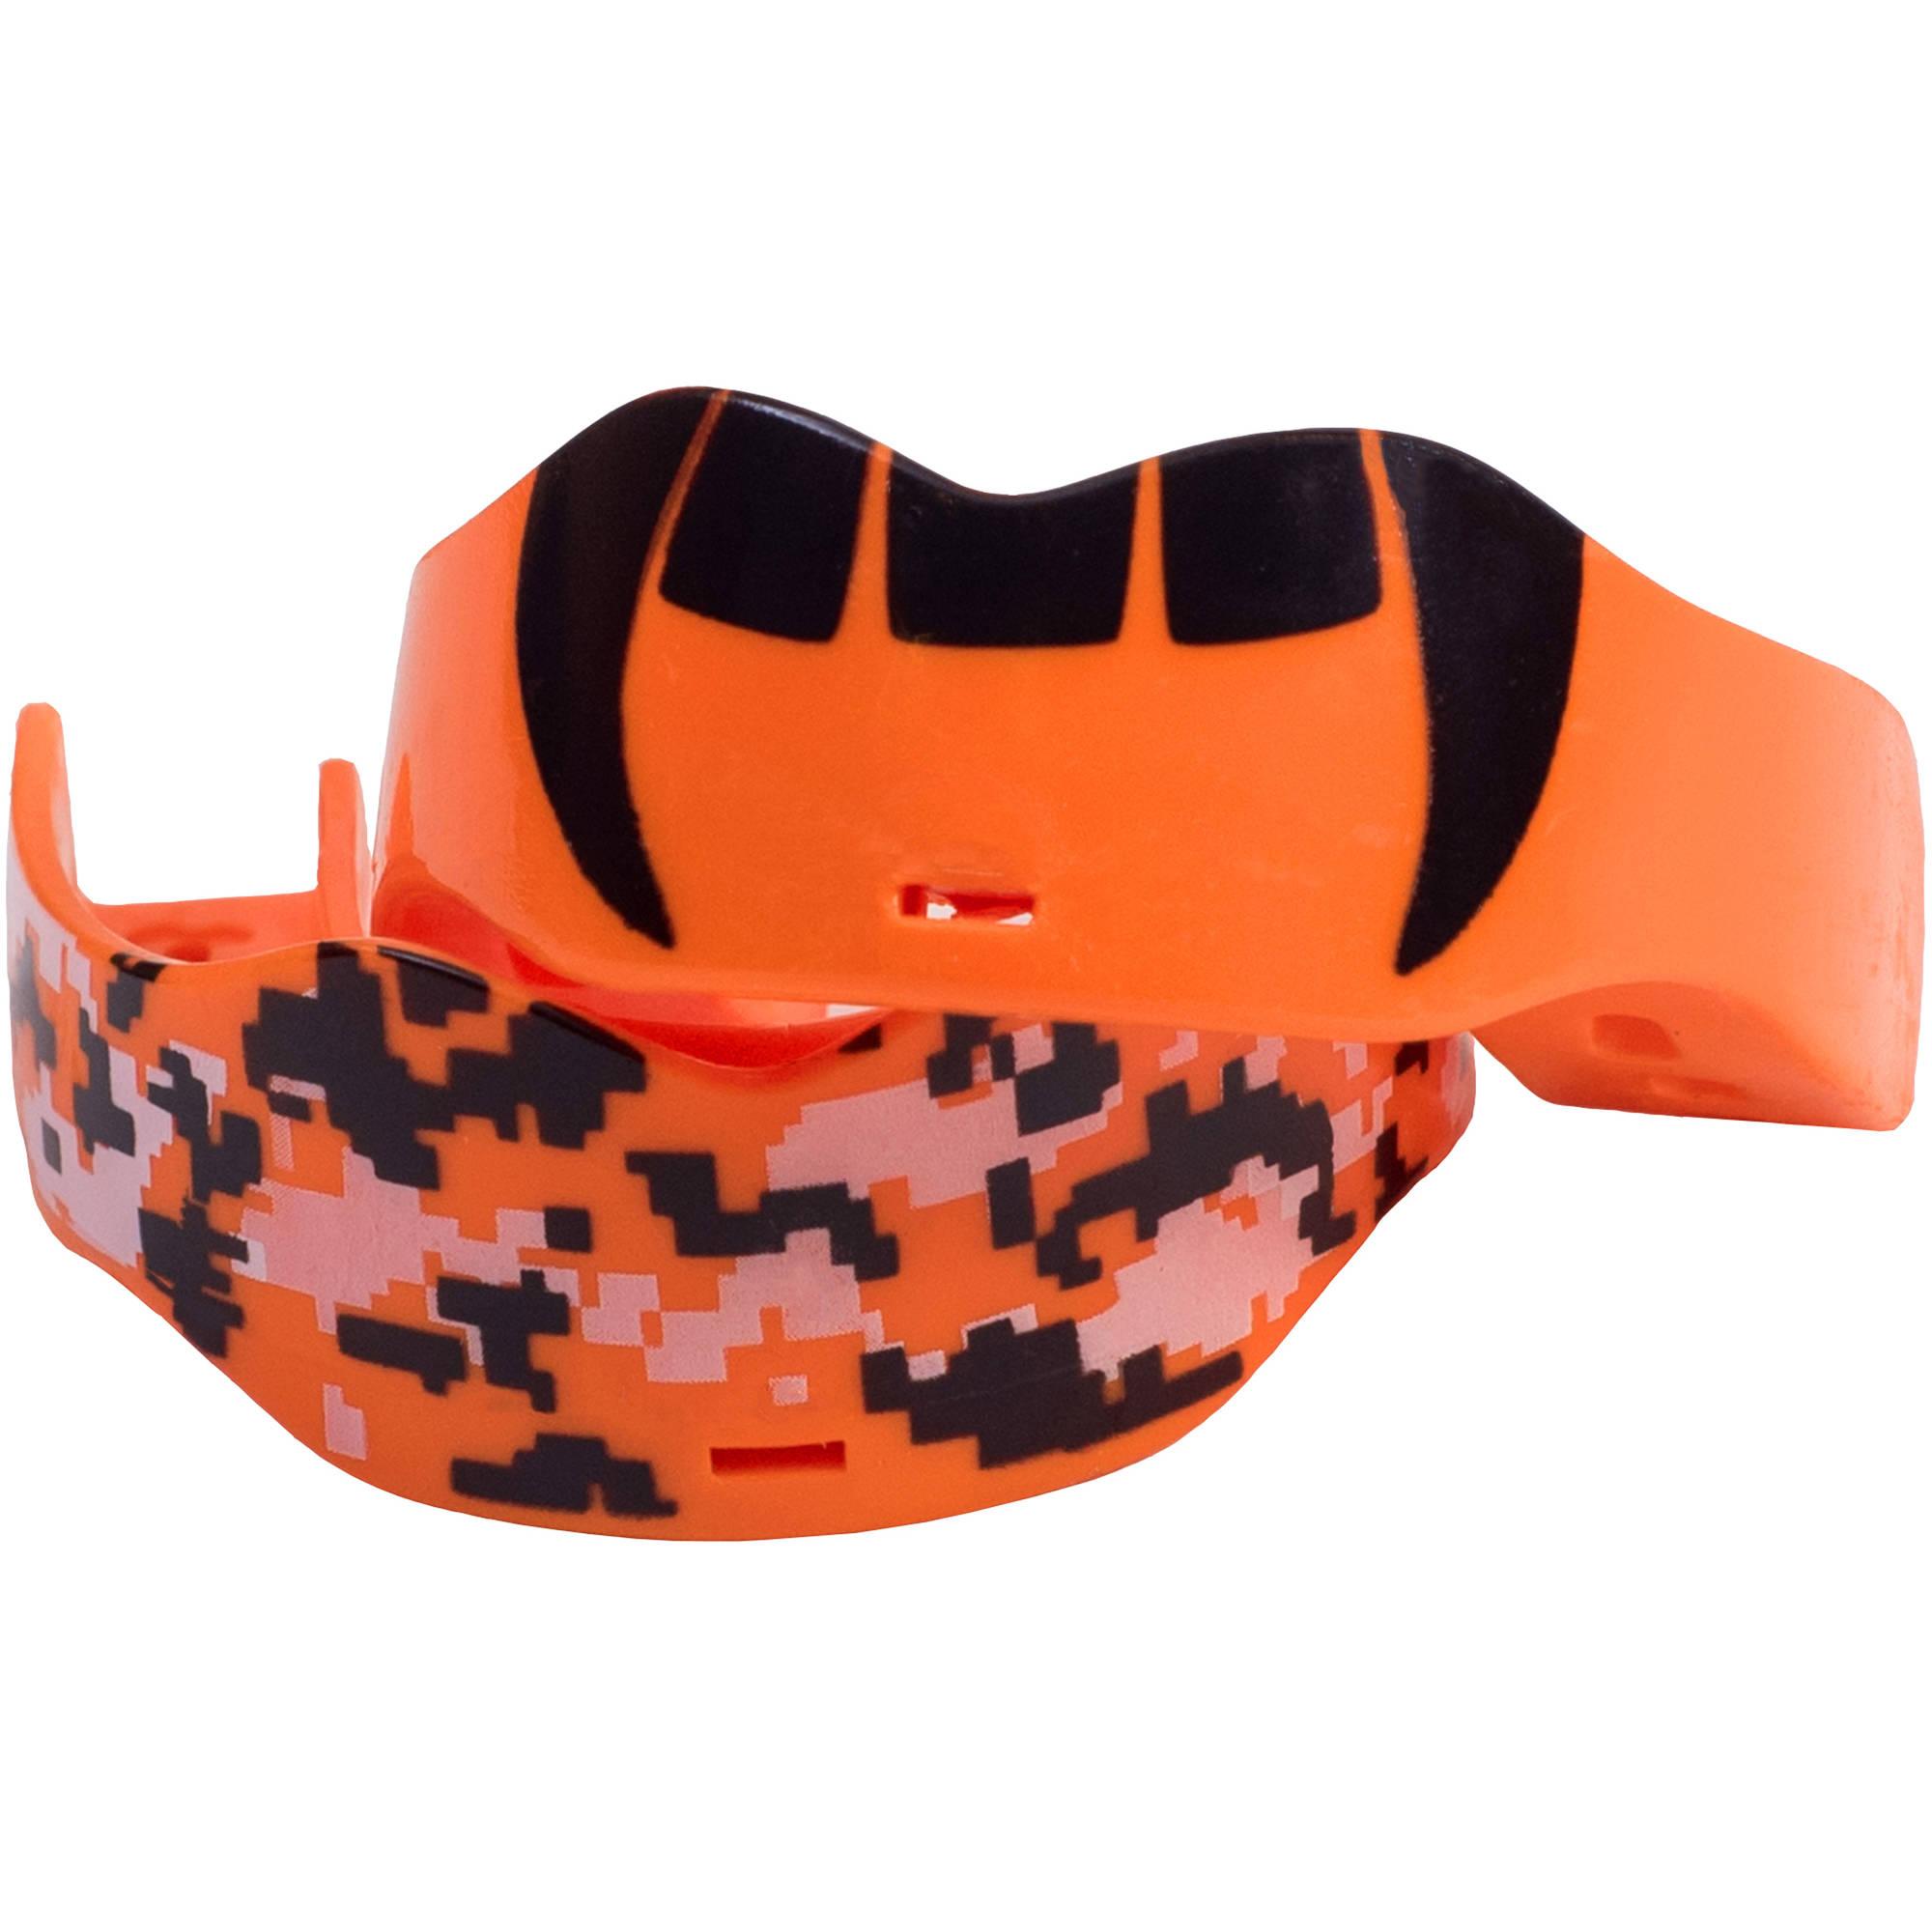 Soldier Sports Custom 7312 Mouthguard, Orange